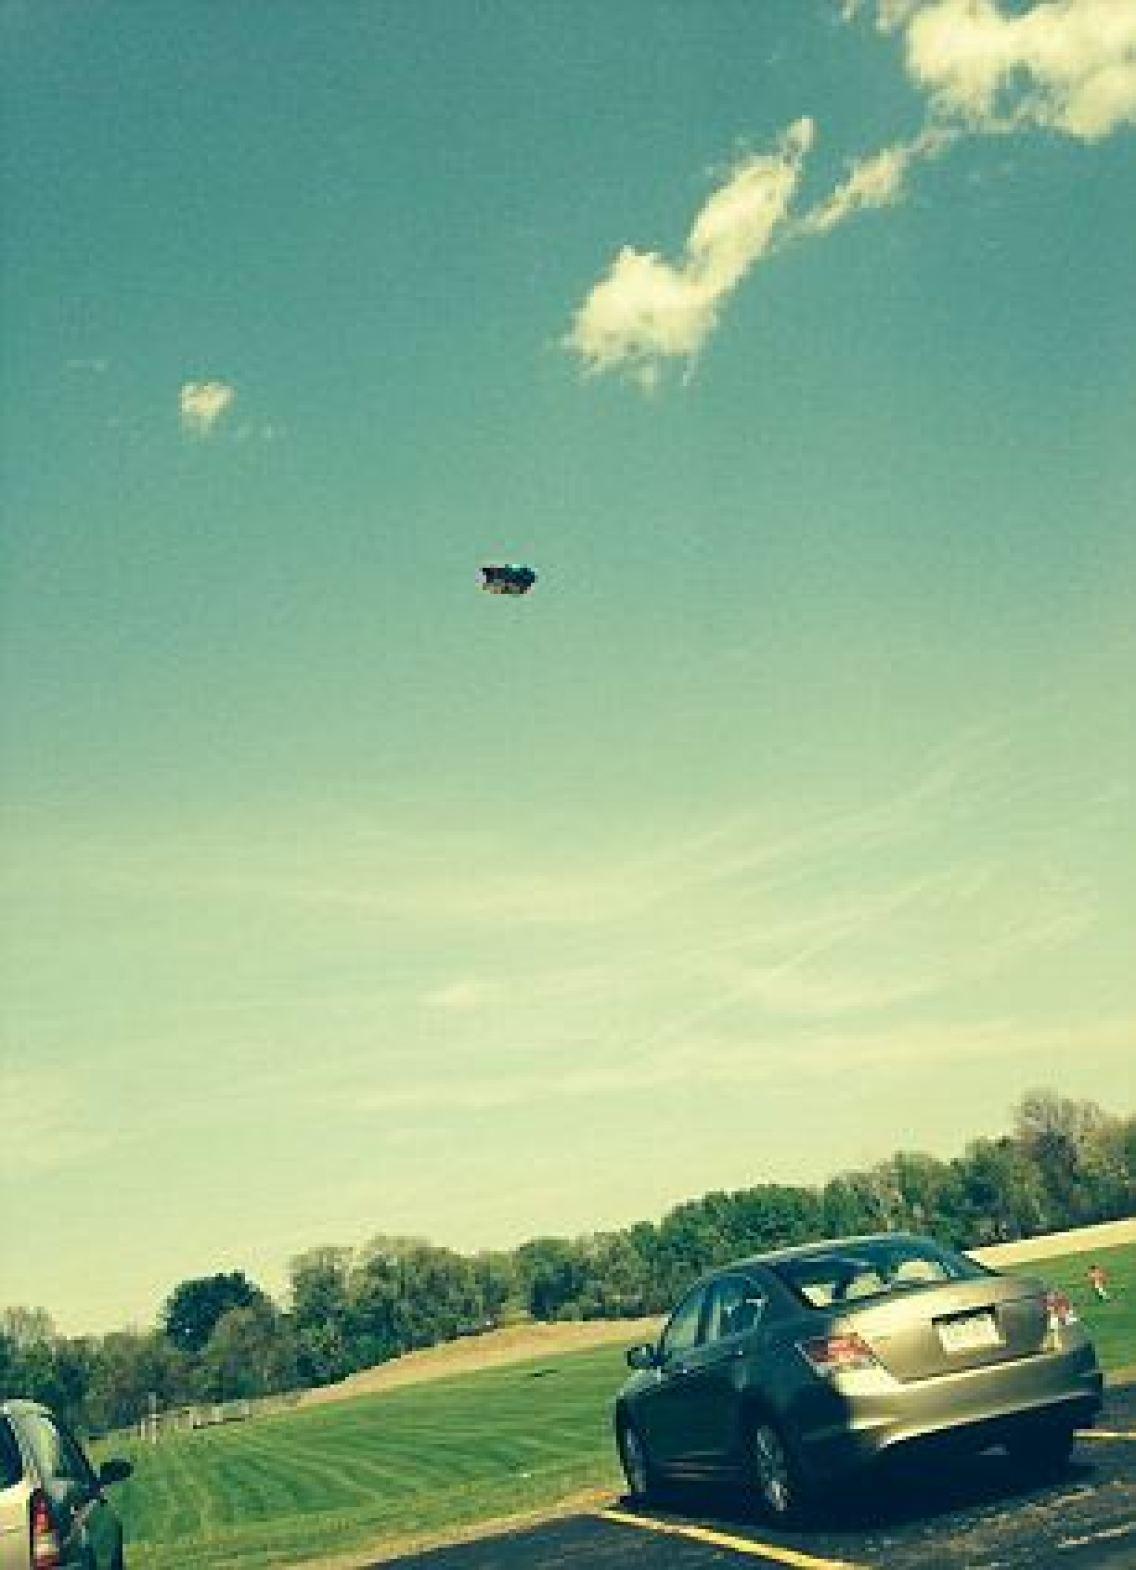 bouncy-house-flying